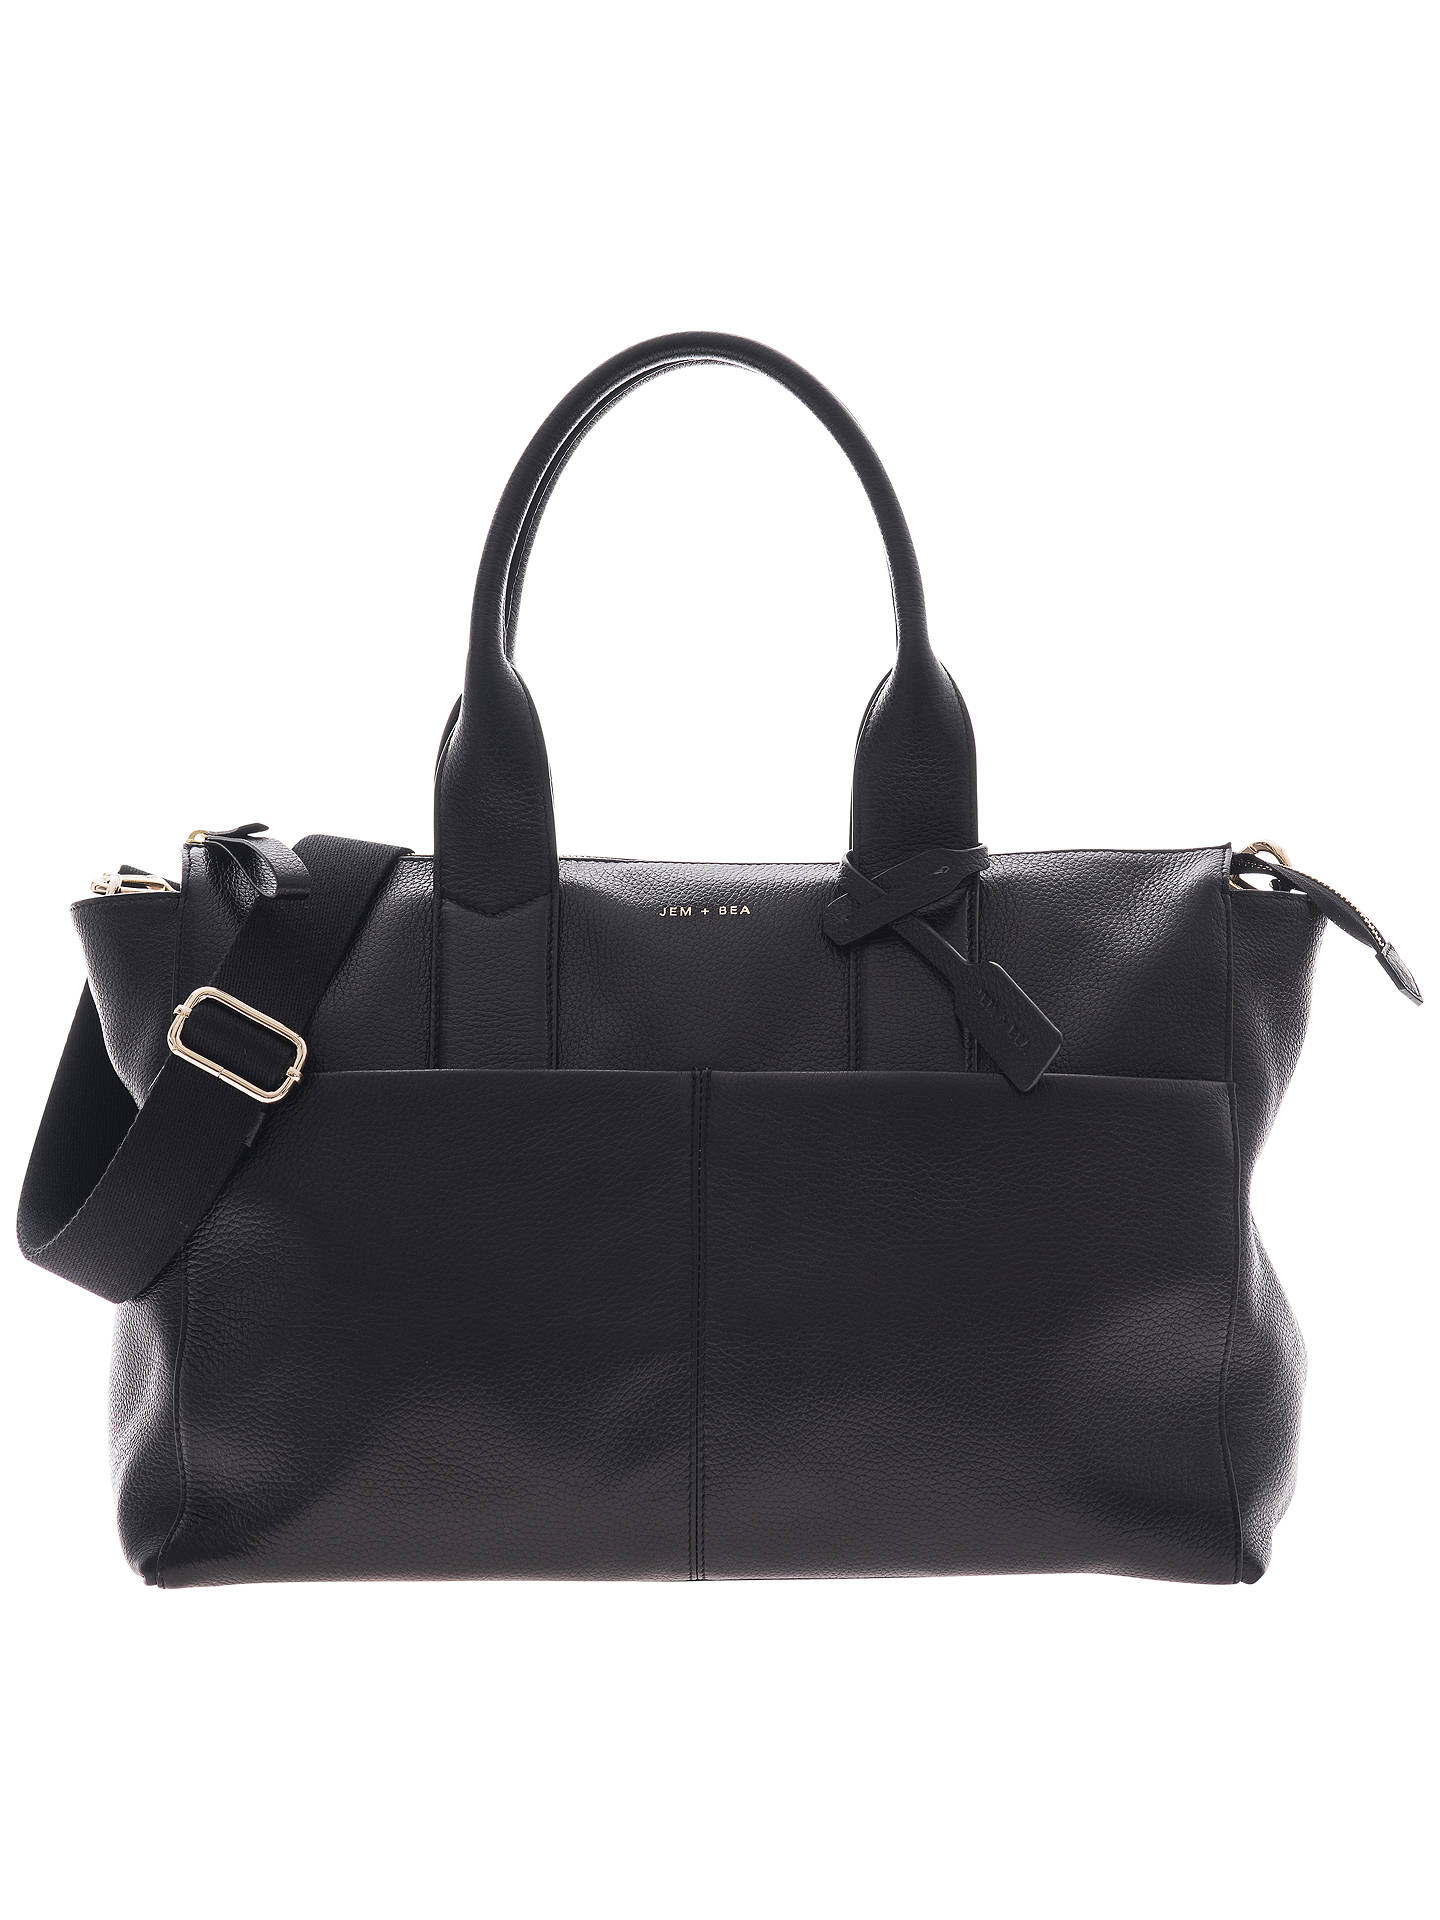 Jem Bea Jemima Tote Changing Bag Black